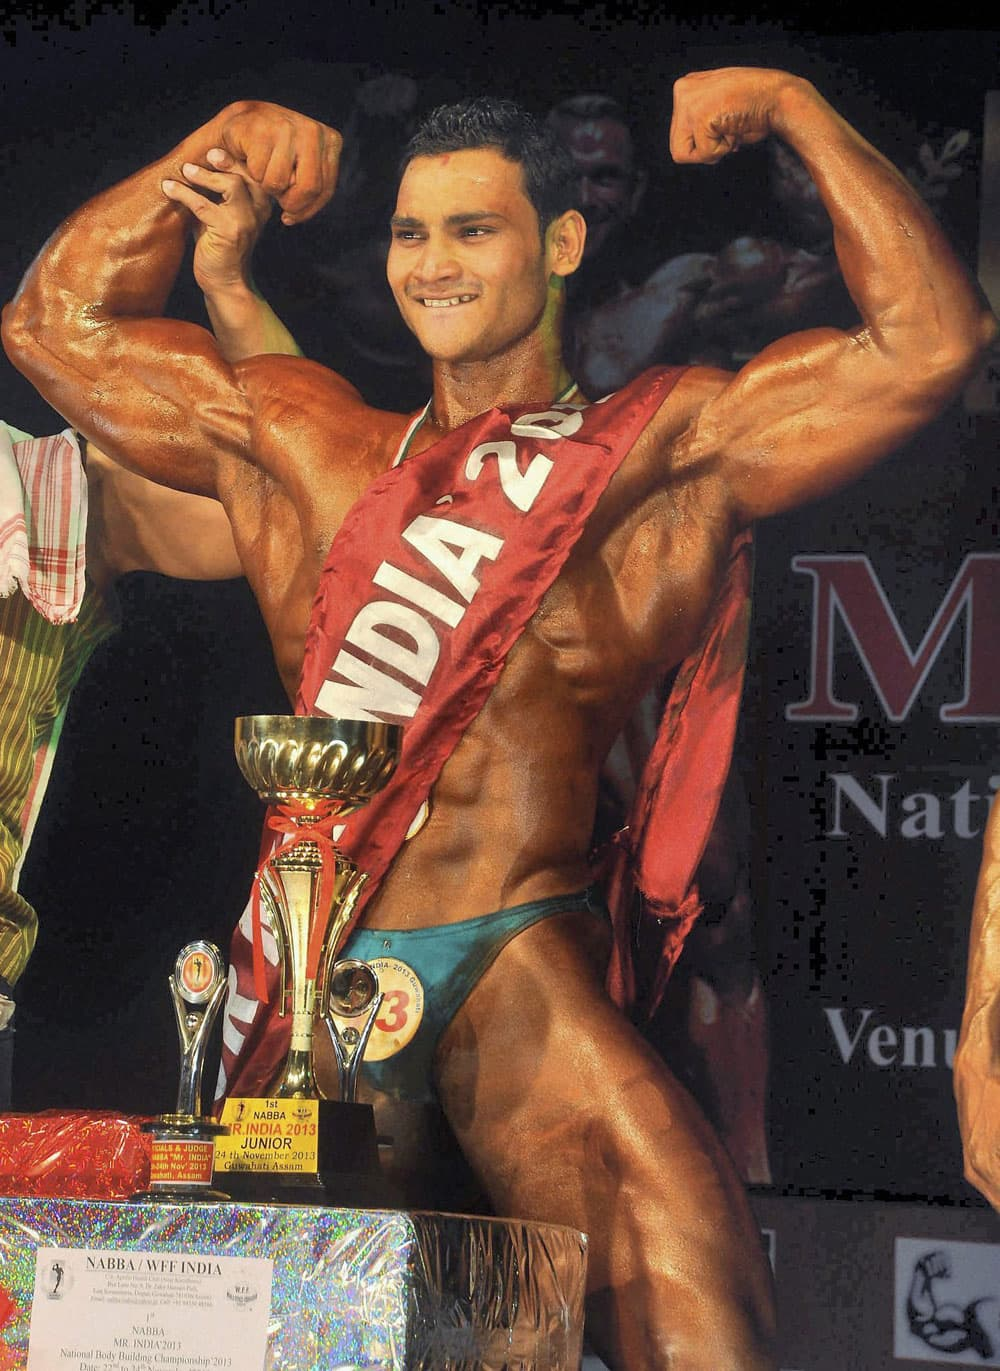 Bikash Kumar Sahoo of Odisha poses after winning the 1st National Body Building Championship 2013 in Guwhati.